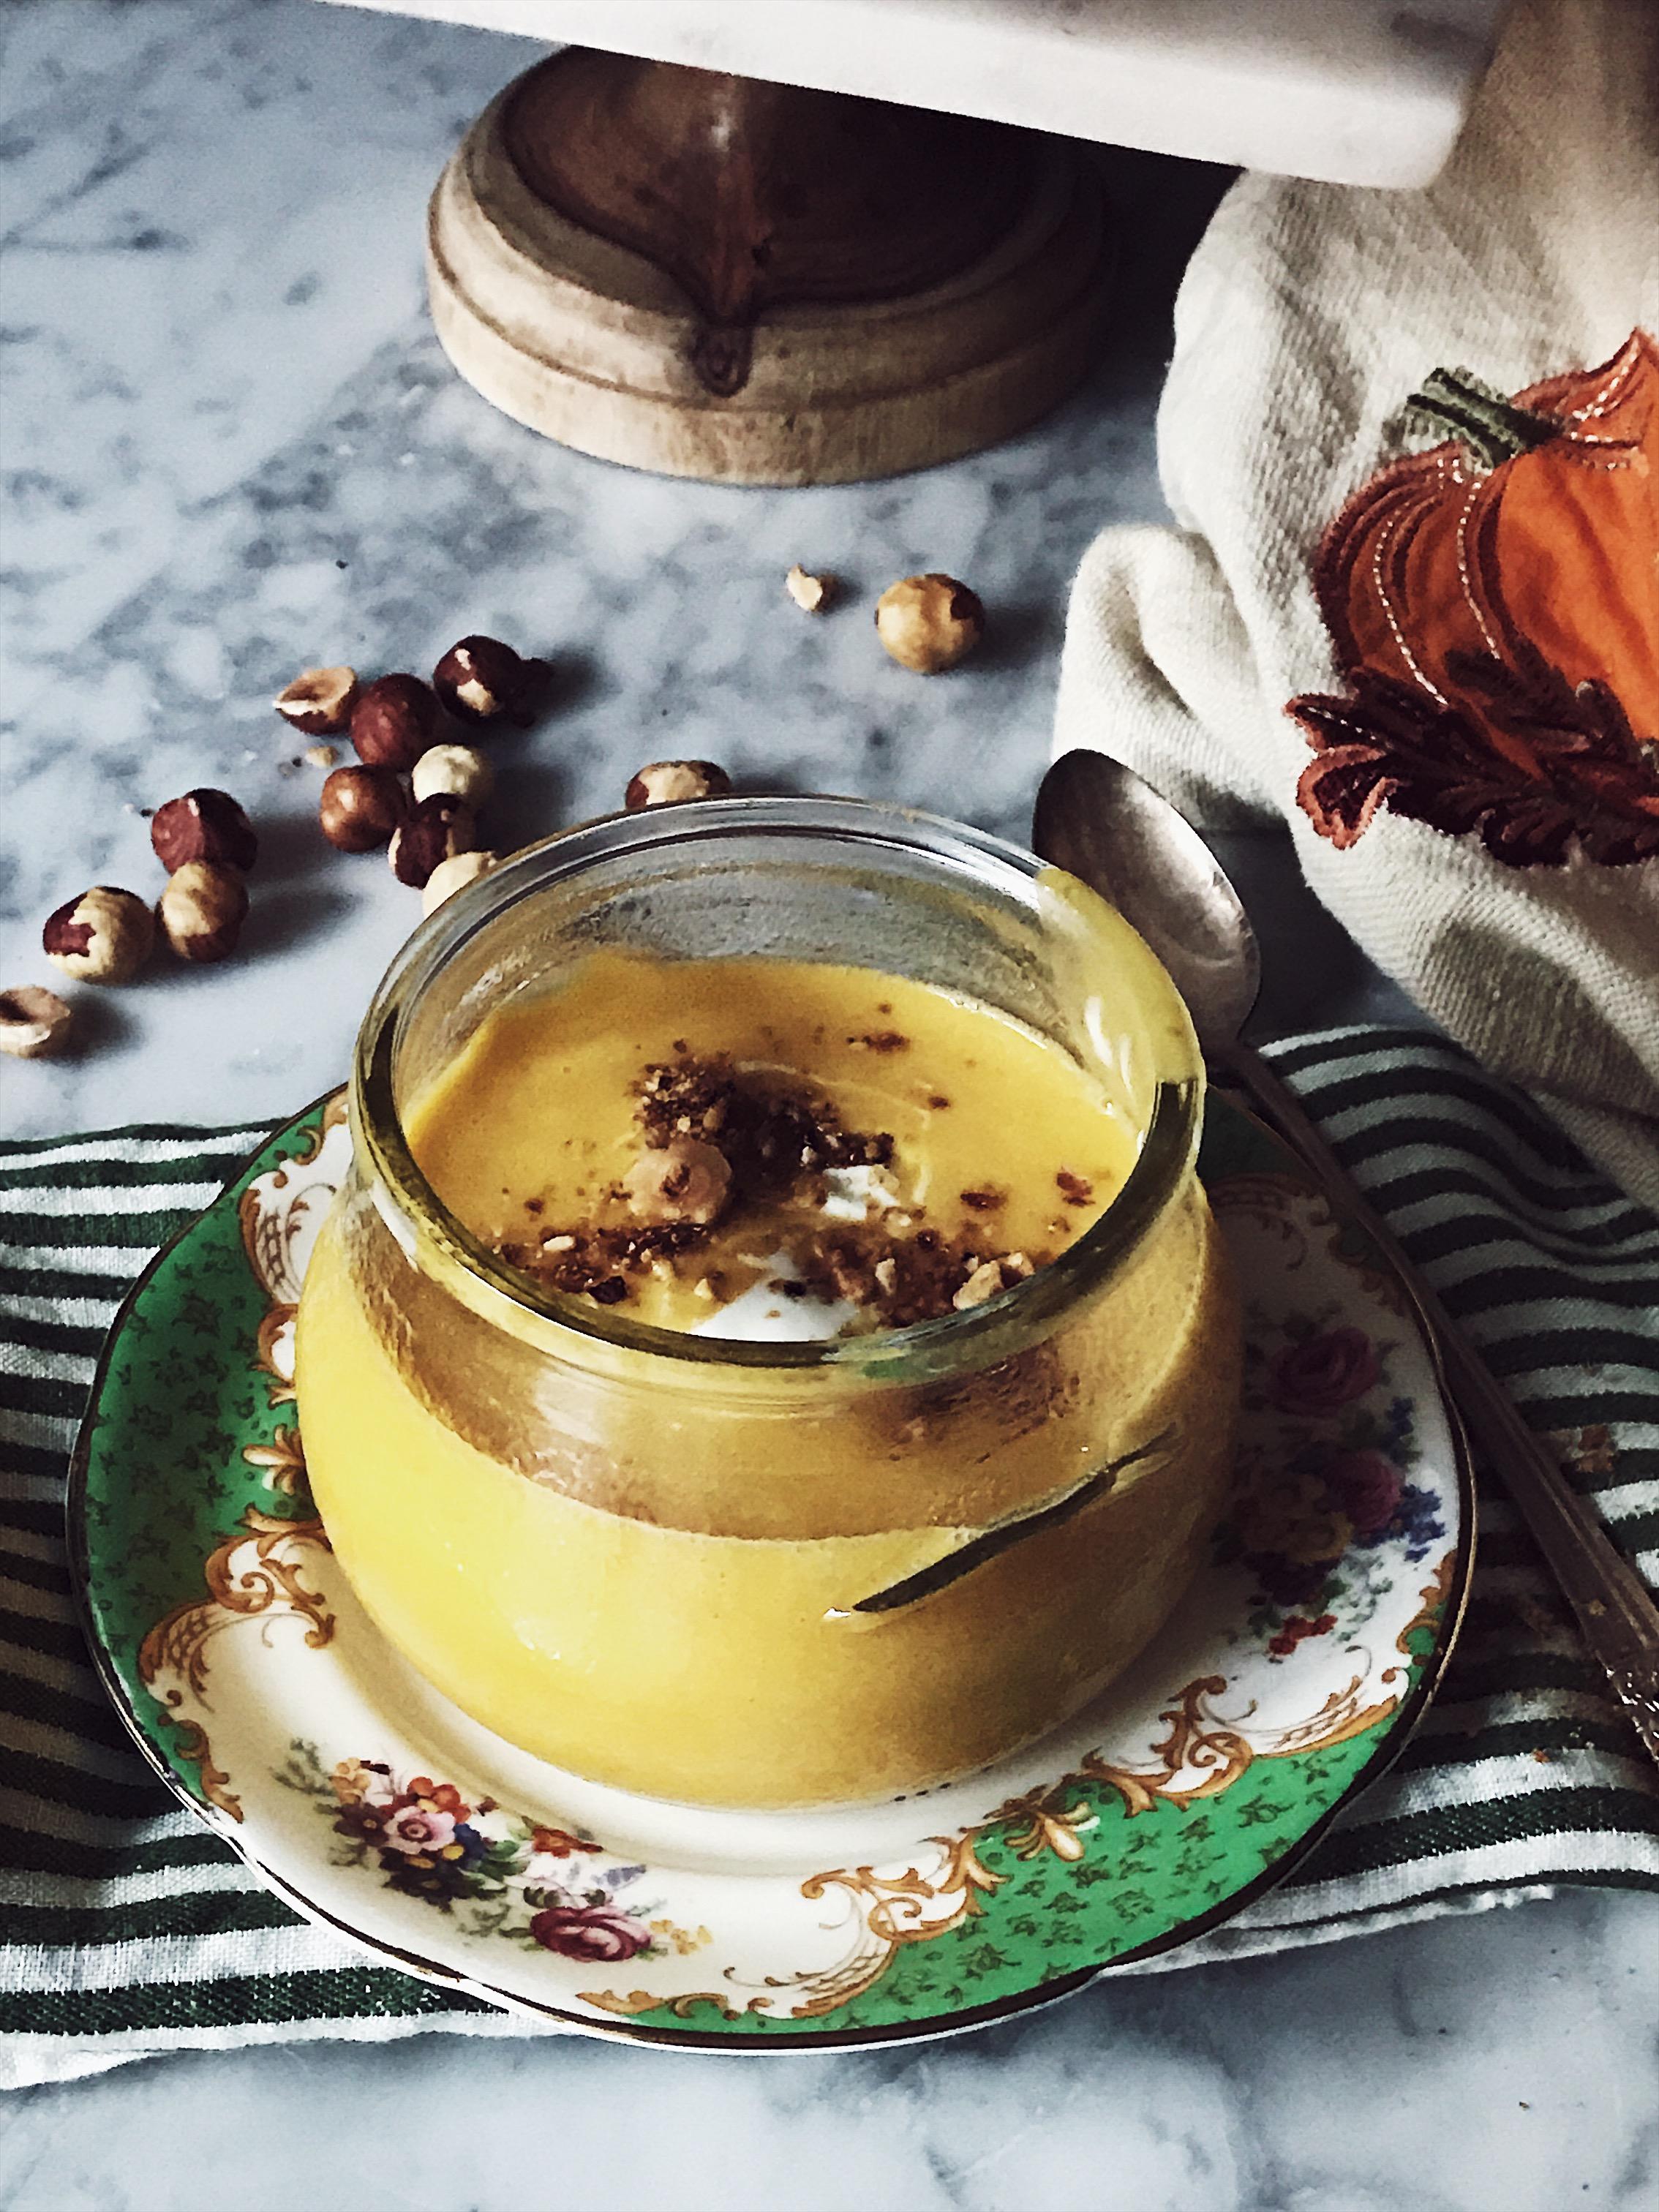 Creamy pumpkin soup recipe the italian way gourmet project creamy pumpkin soup recipe how to make creamy pumpkin soup the italian way get forumfinder Gallery